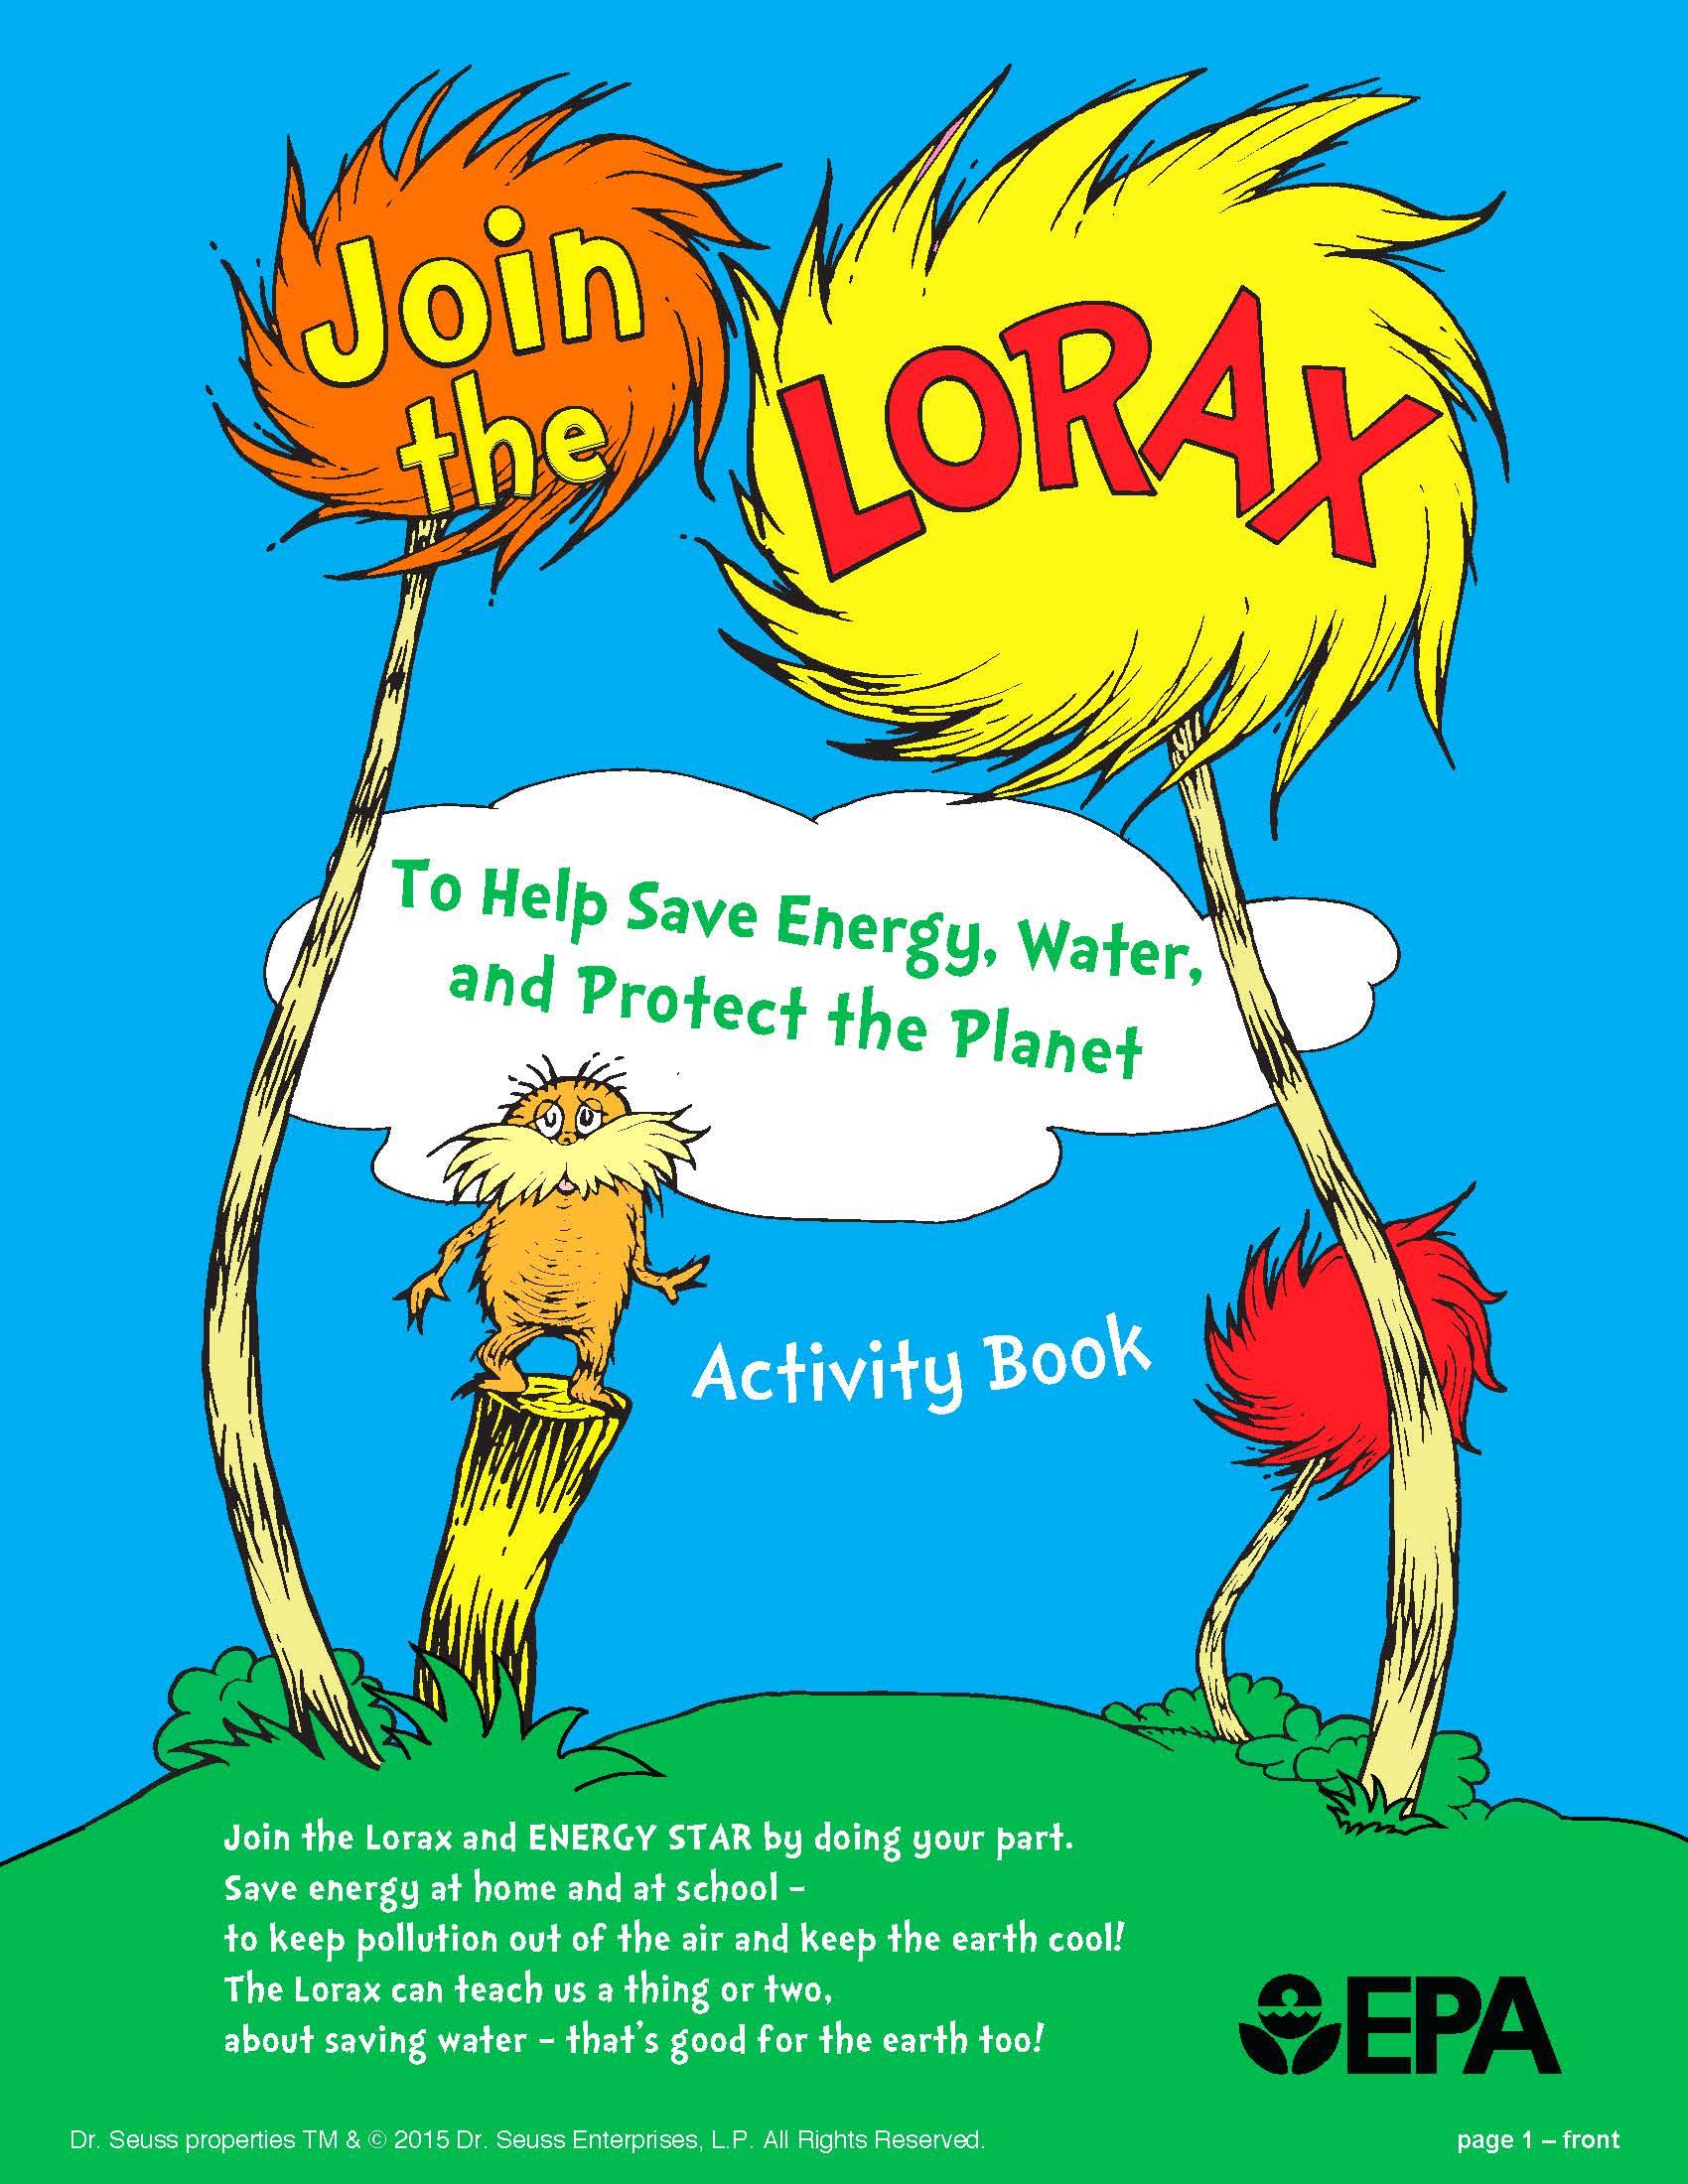 LoraxActivityBook-cover.jpg